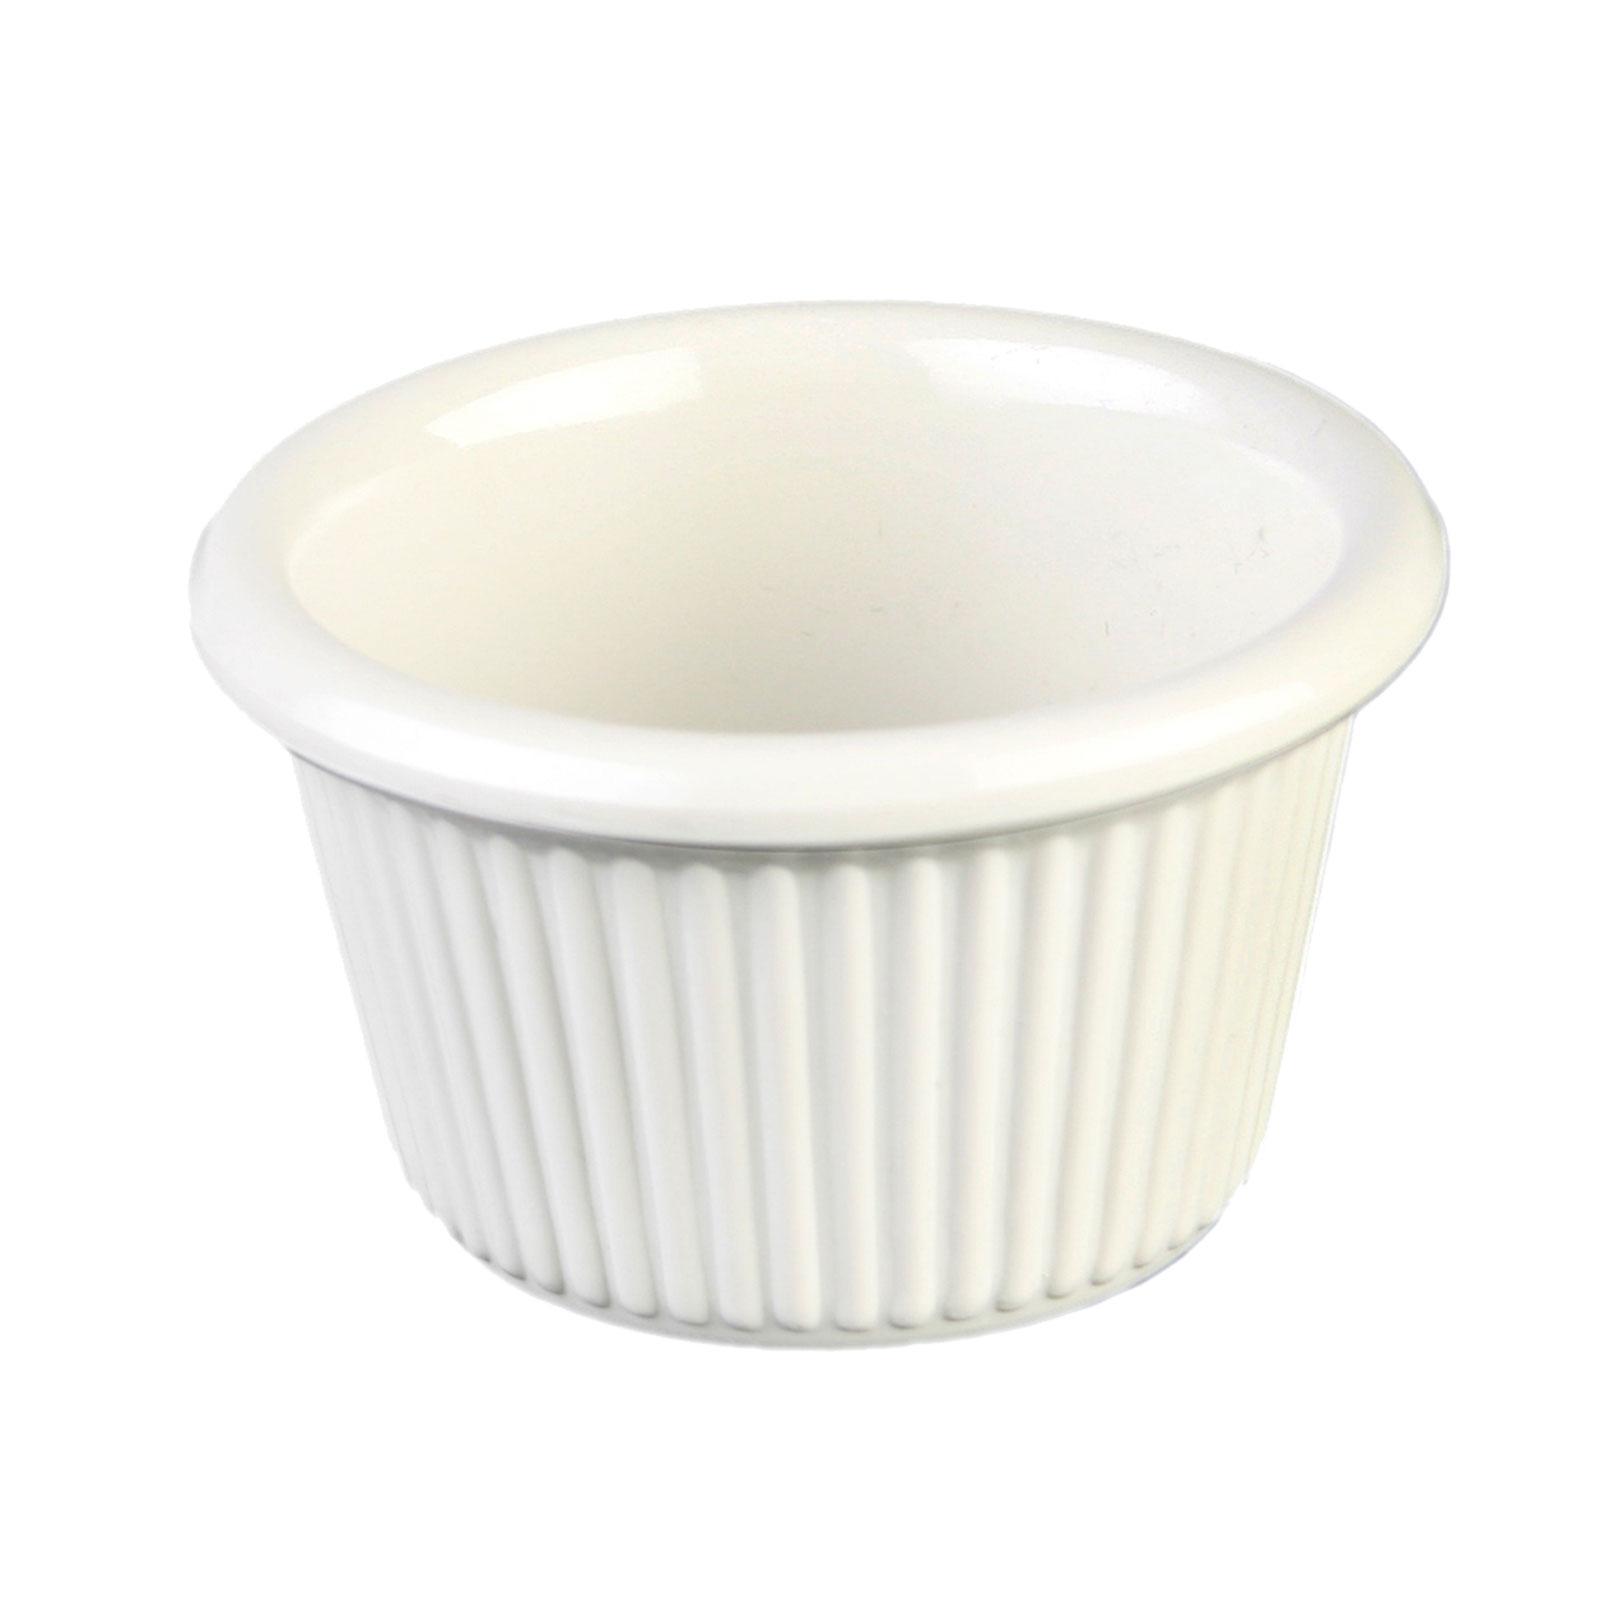 Thunder Group ML507B1 ramekin / sauce cup, plastic